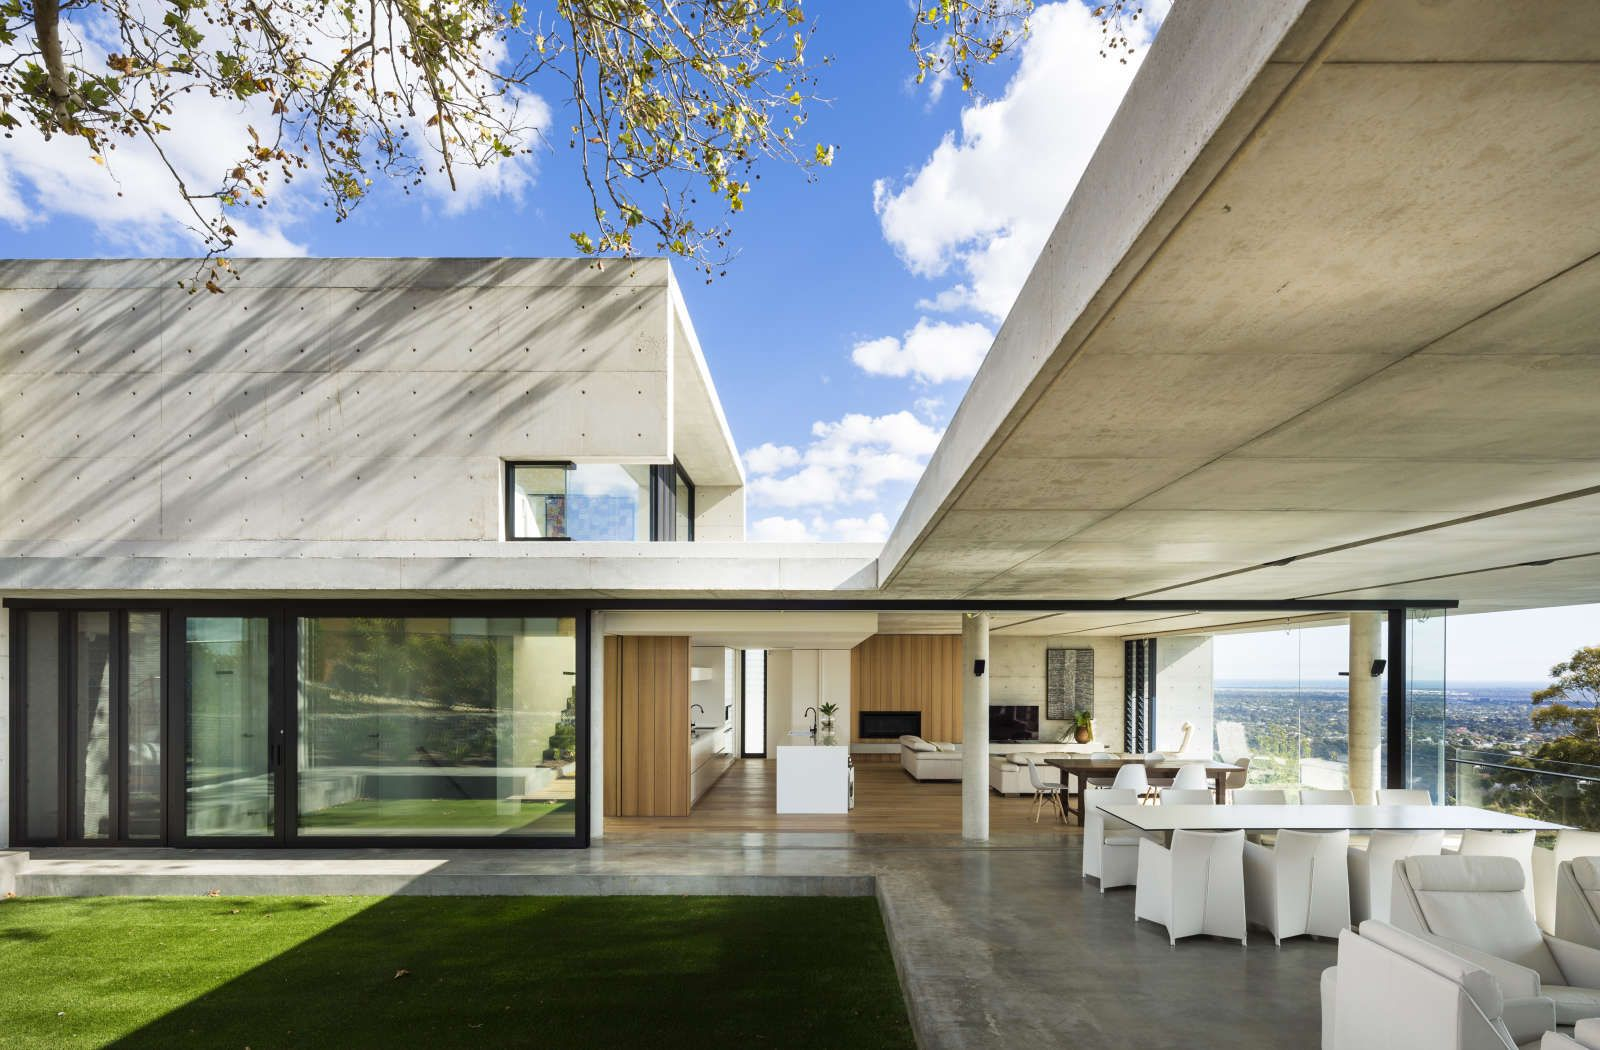 Plane Tree House, Adelaide - Bookmarc Online | home details ... on online furniture, online blueprints, online magazines,